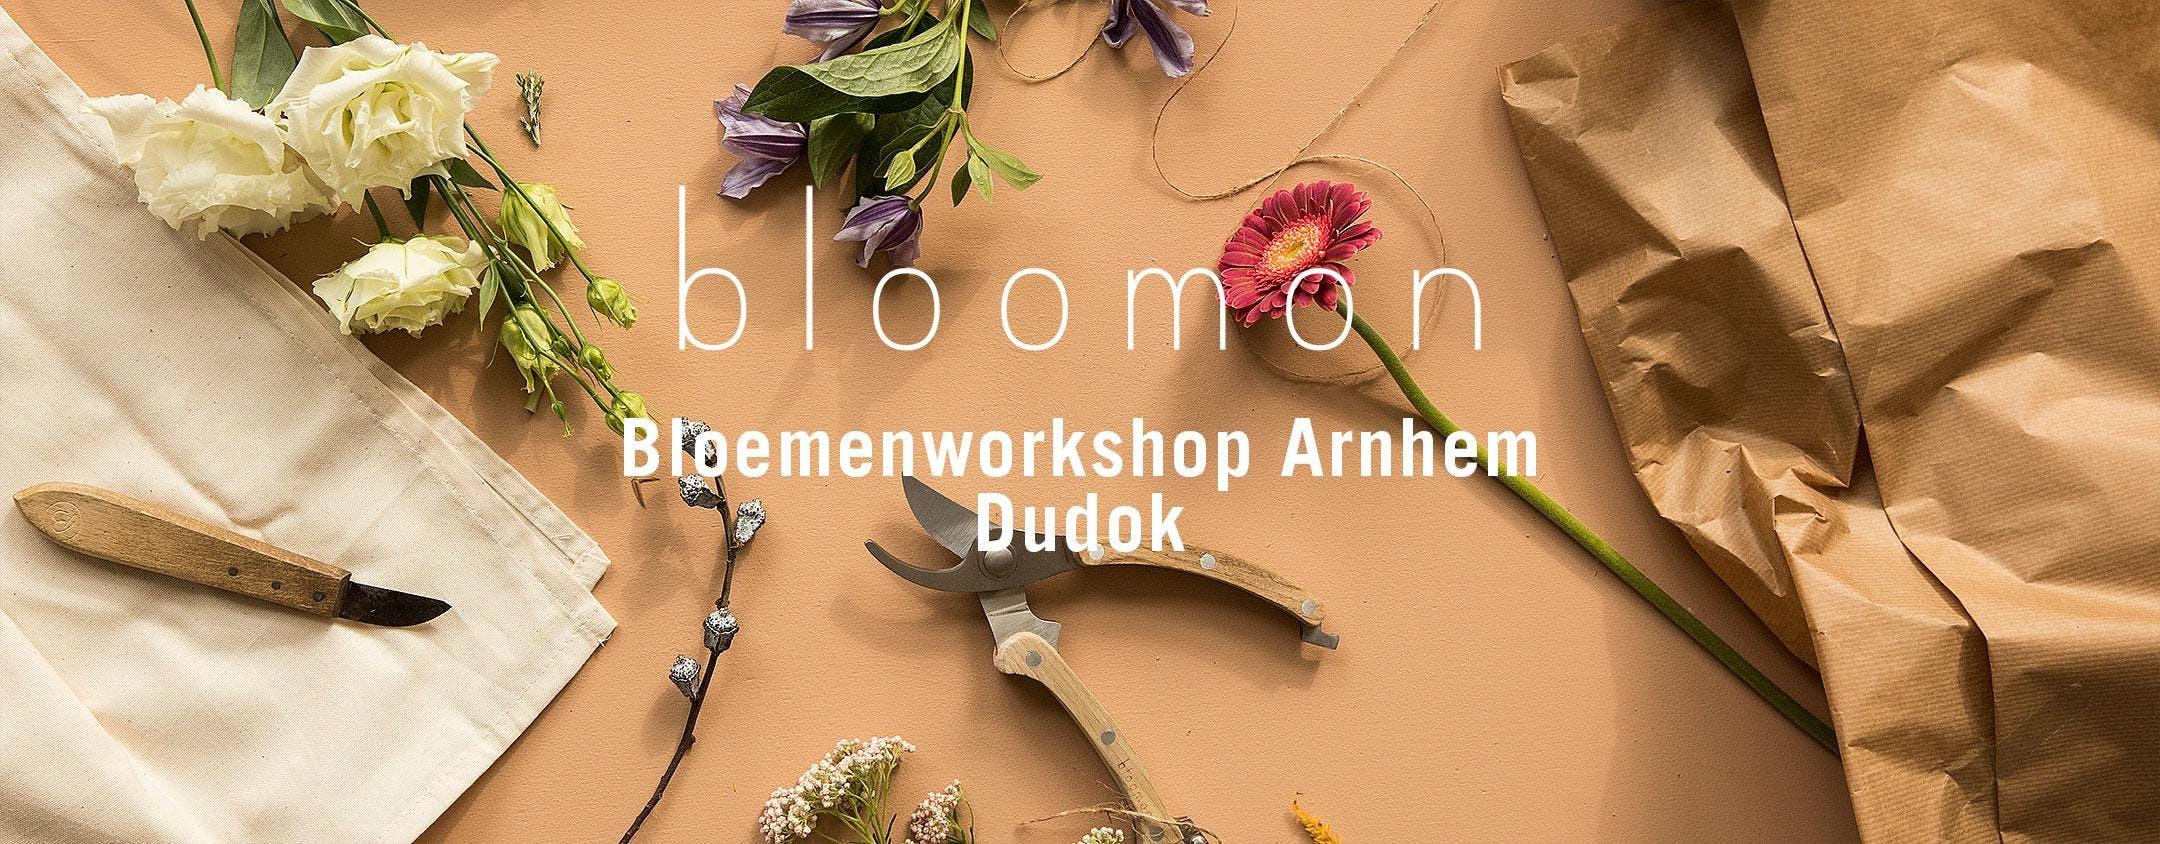 Bloomon Workshop: 19 januari 2019 | Arnhem, D